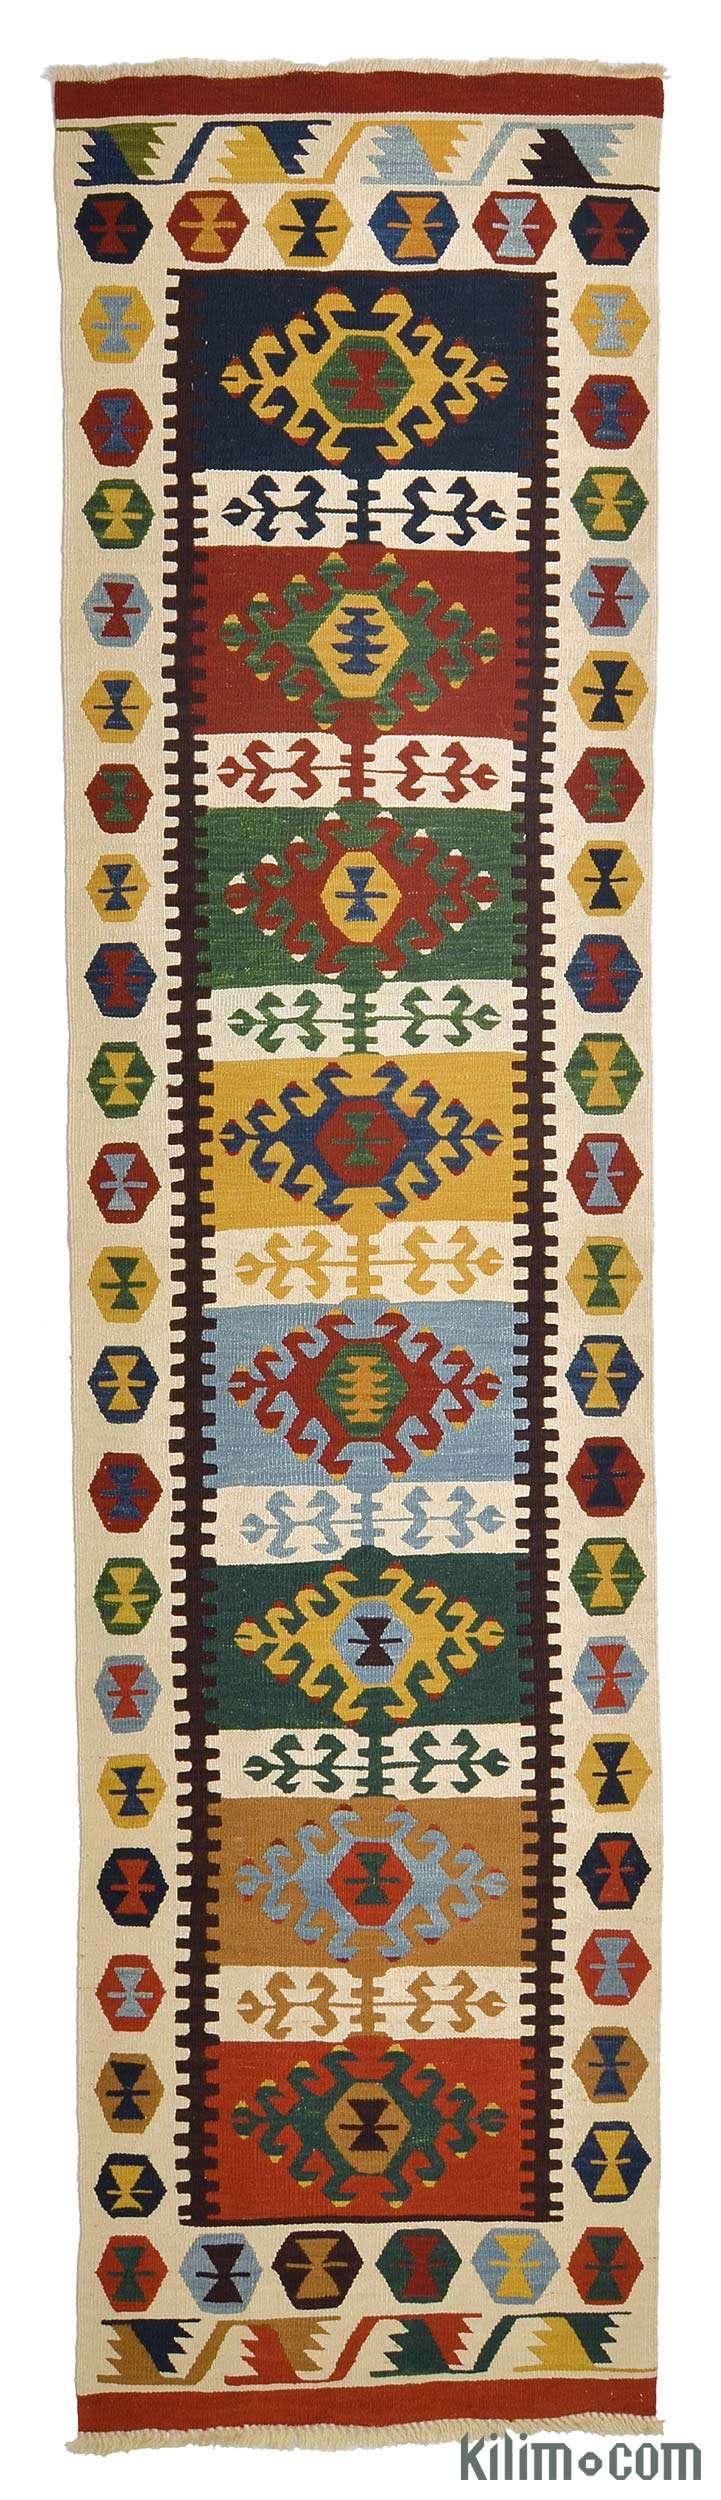 Multicolor New Turkish Kilim Runner - K0005706